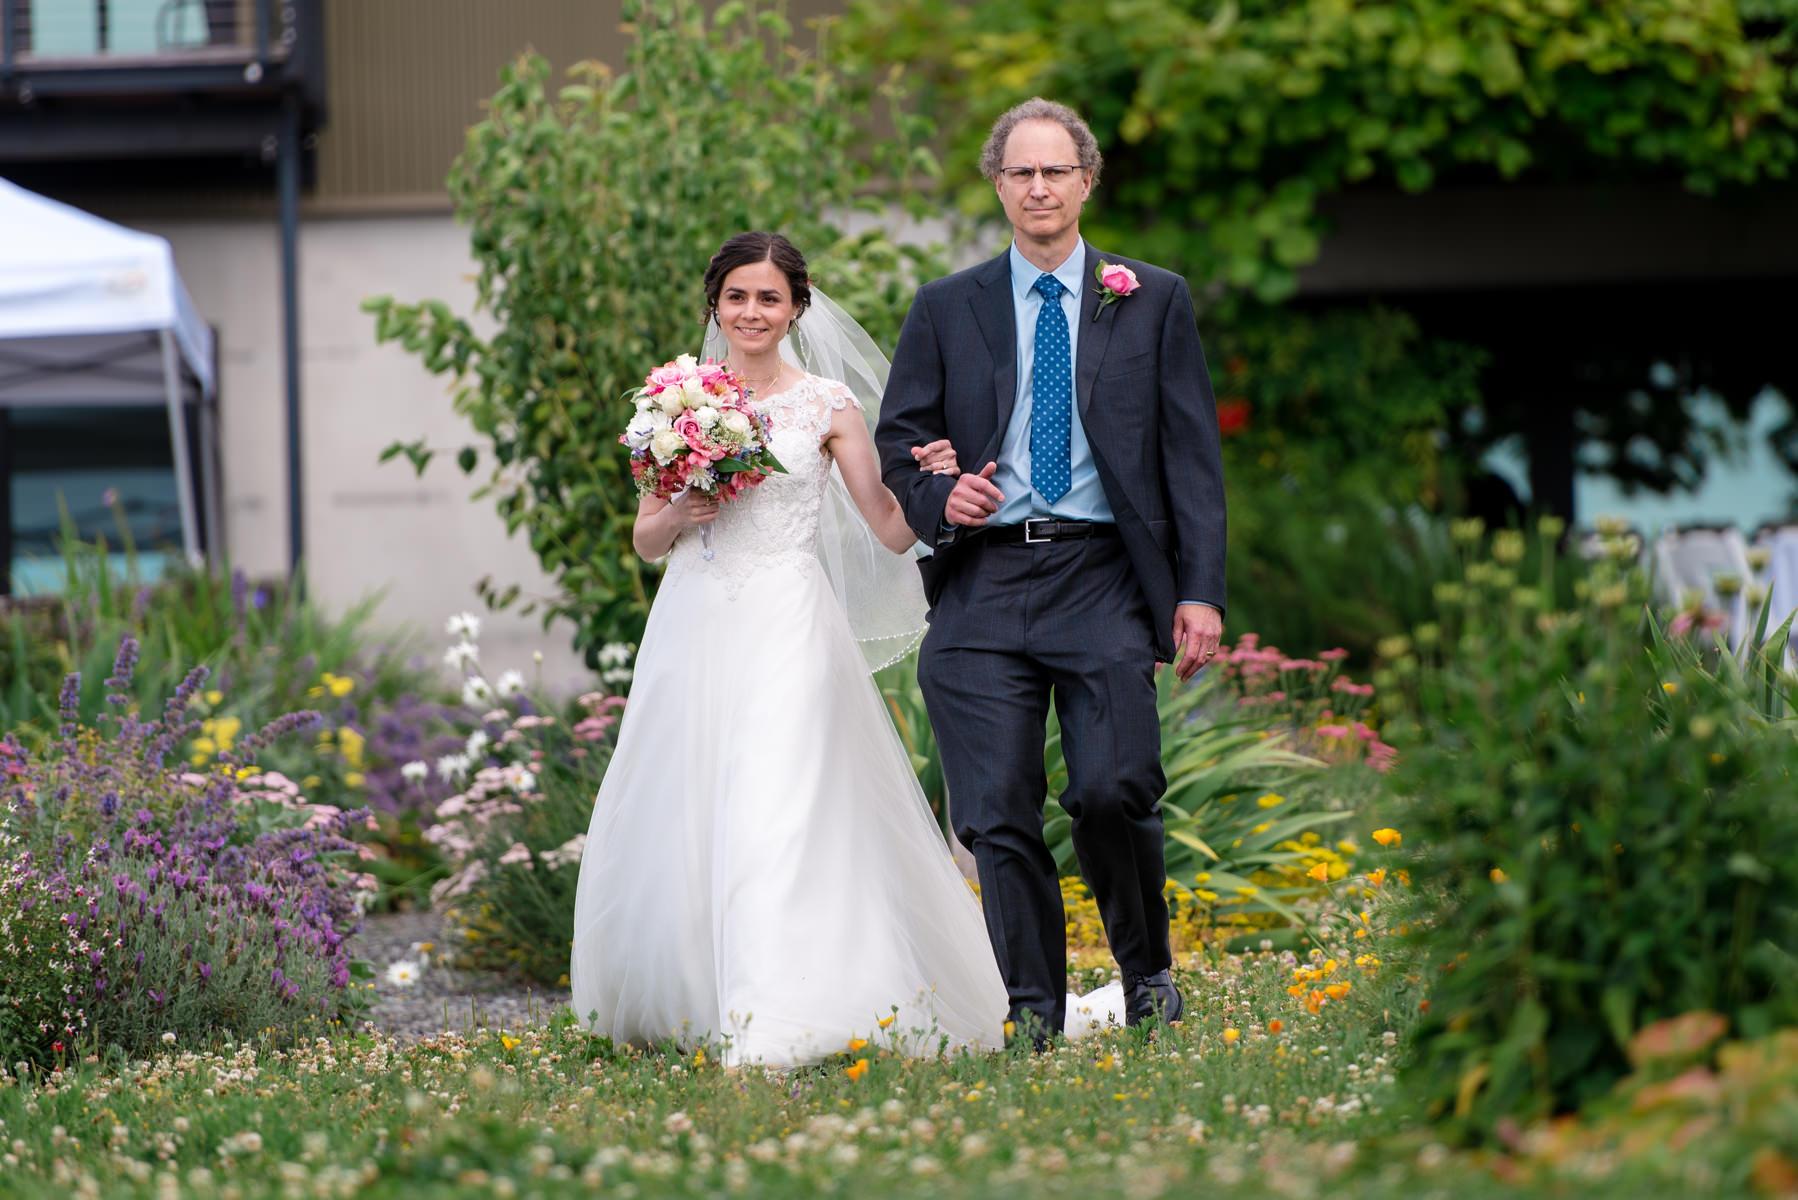 Andrew Tat - Documentary Wedding Photography - Kirkland, Washington - Emily & Cuauh - 06.JPG